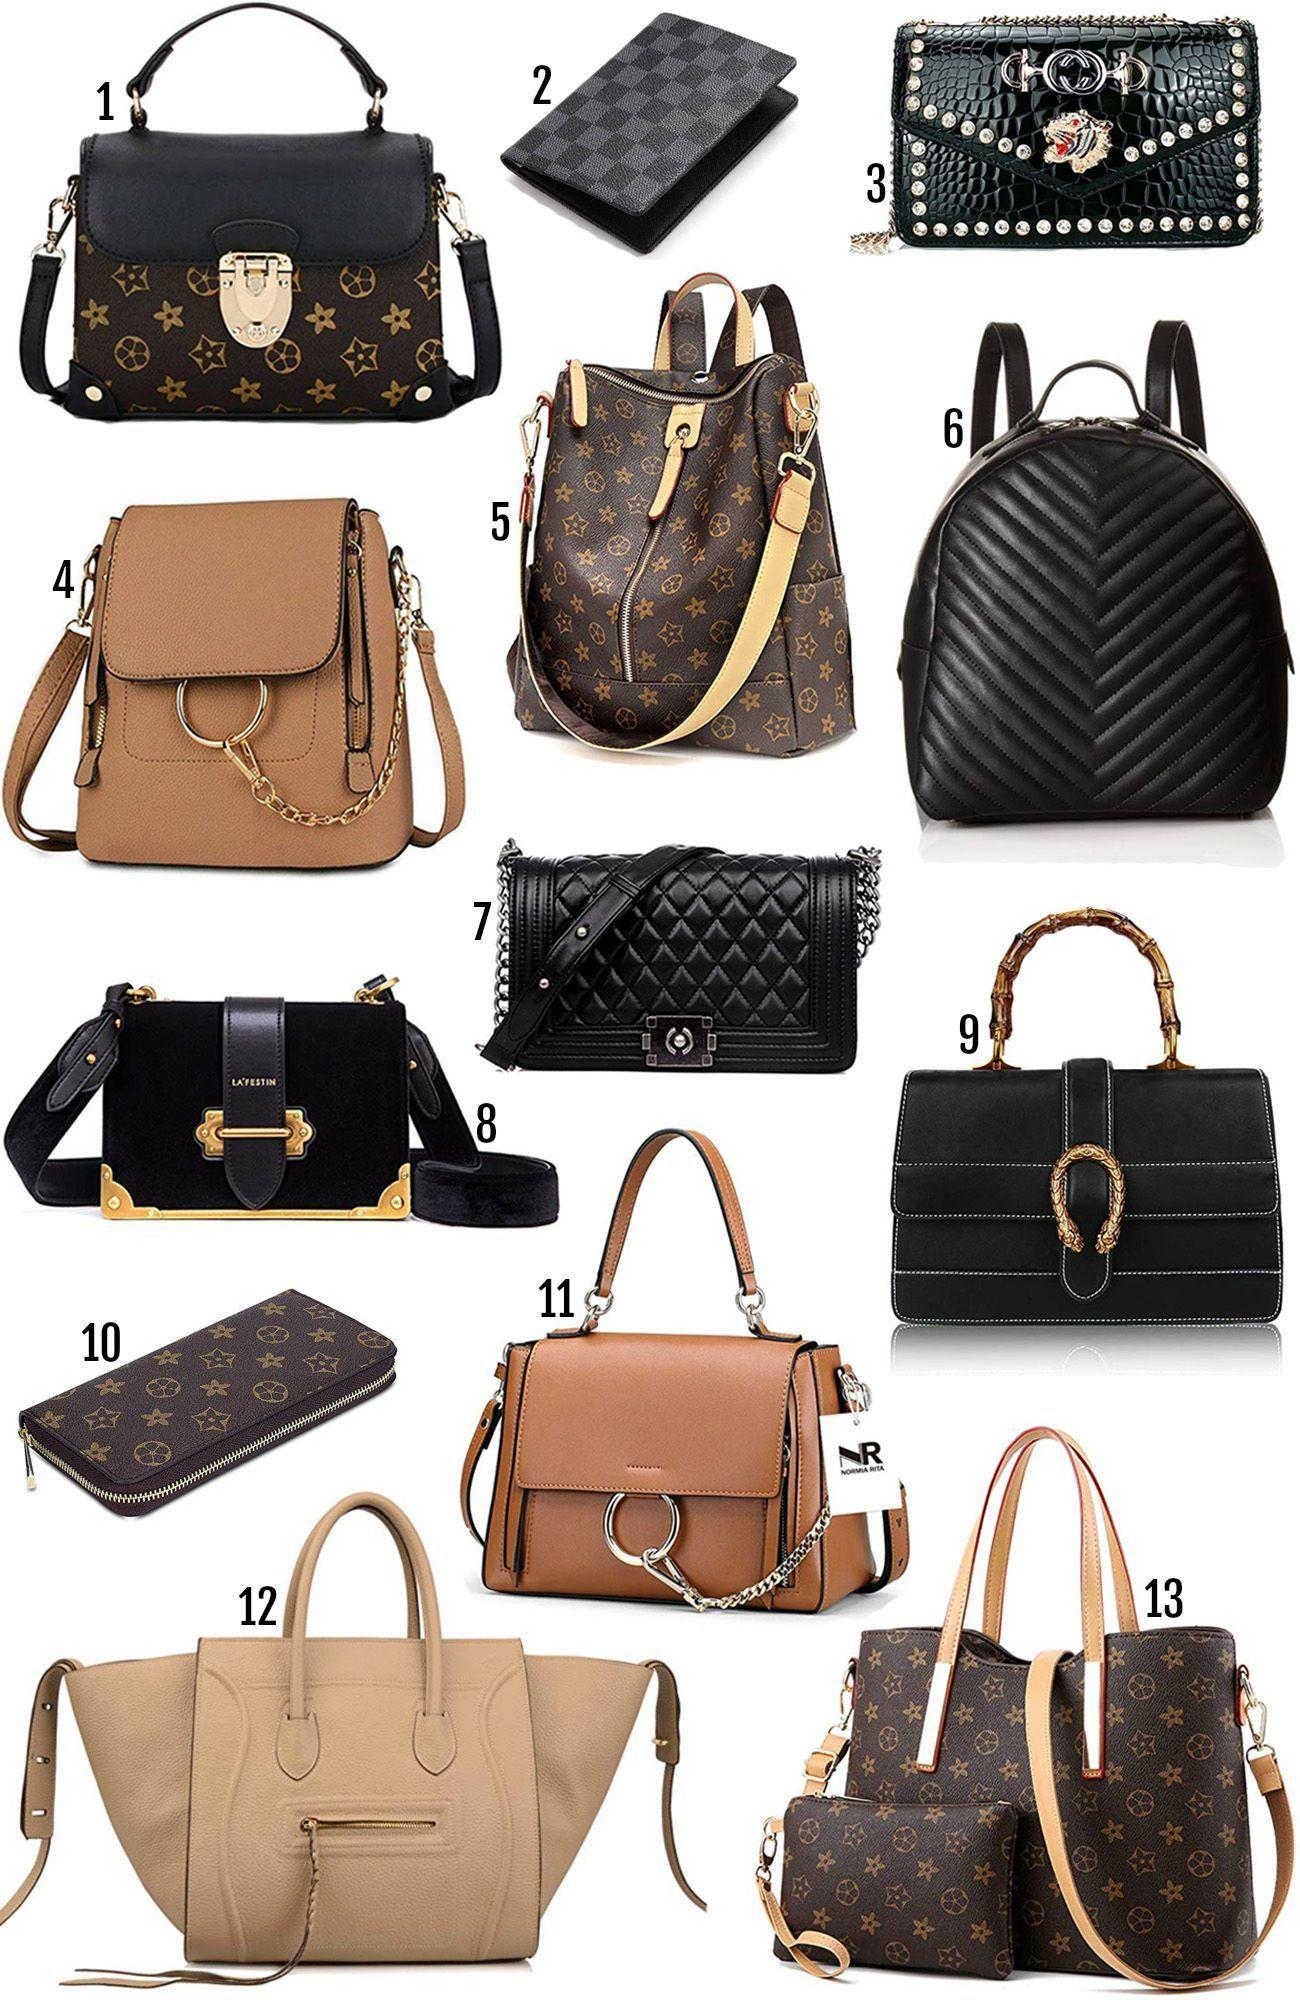 Mash Elle beauty blogger designer bag dupe Amazon prime